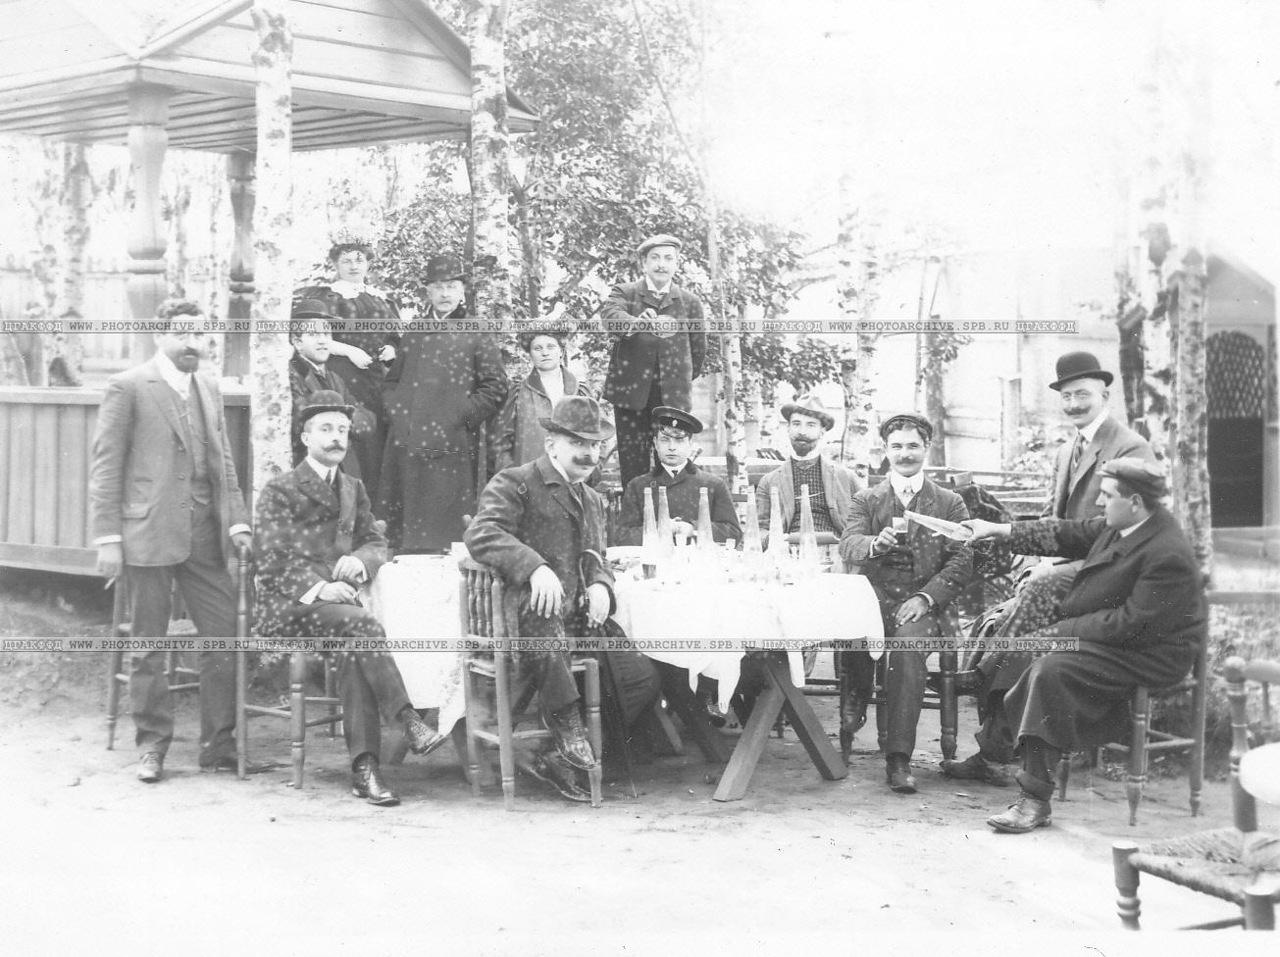 0_a678f_359c8c20_XXXLГруппа участников автопробега в саду трактира за столиками